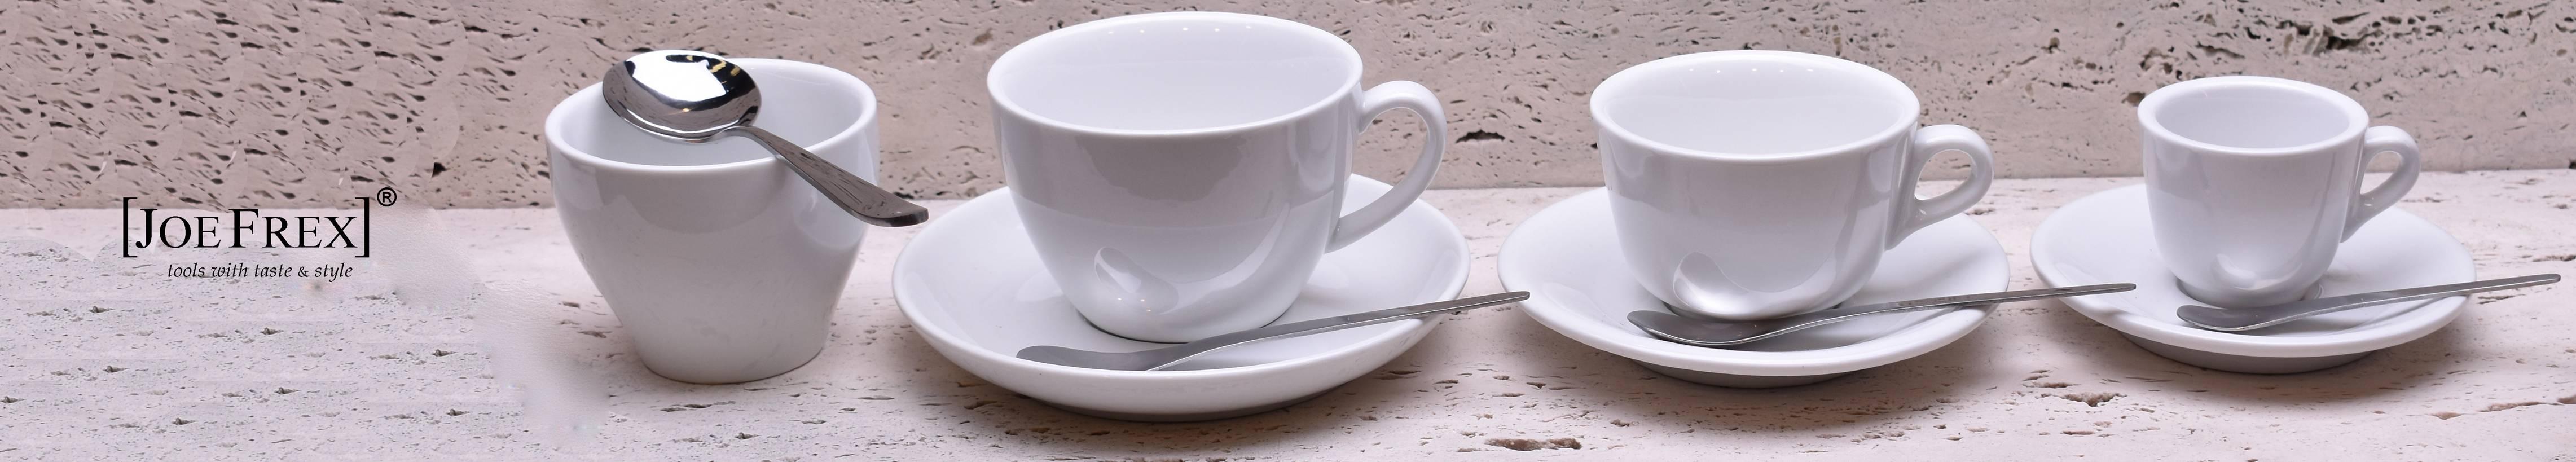 k-9_italian_espresso_cappuccino_cups_cupping_bowls